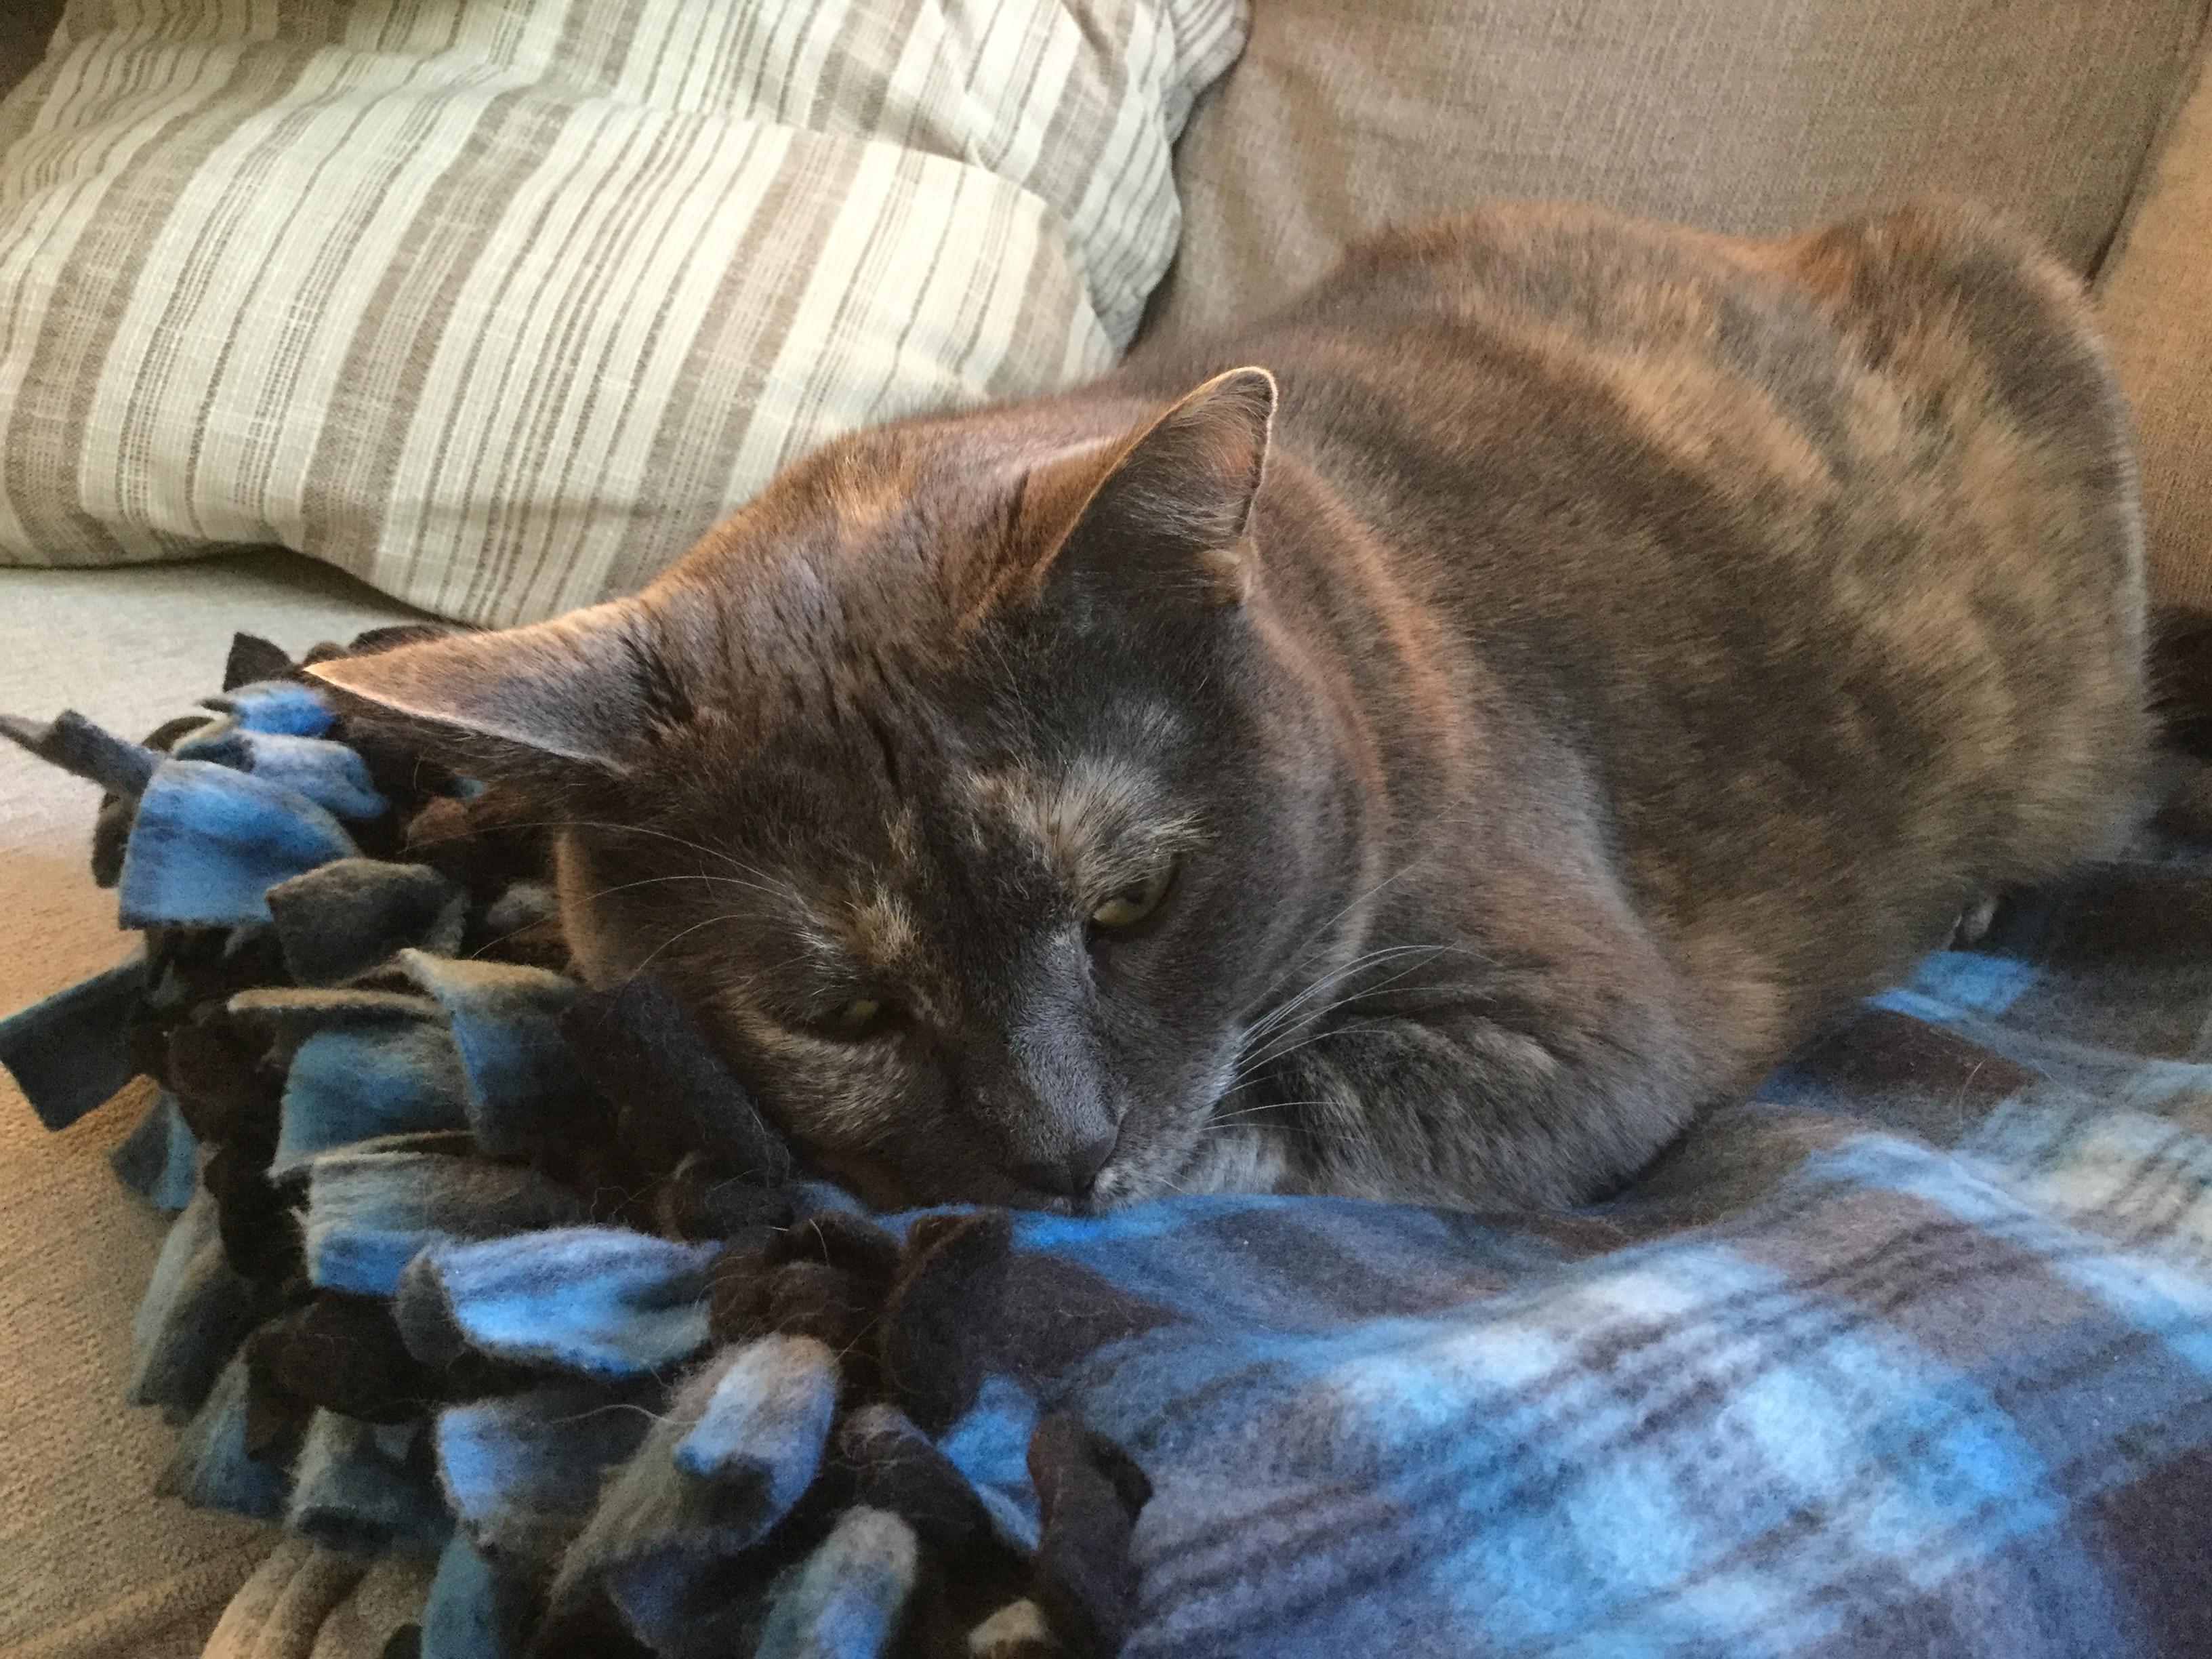 The lazy, lazy cat